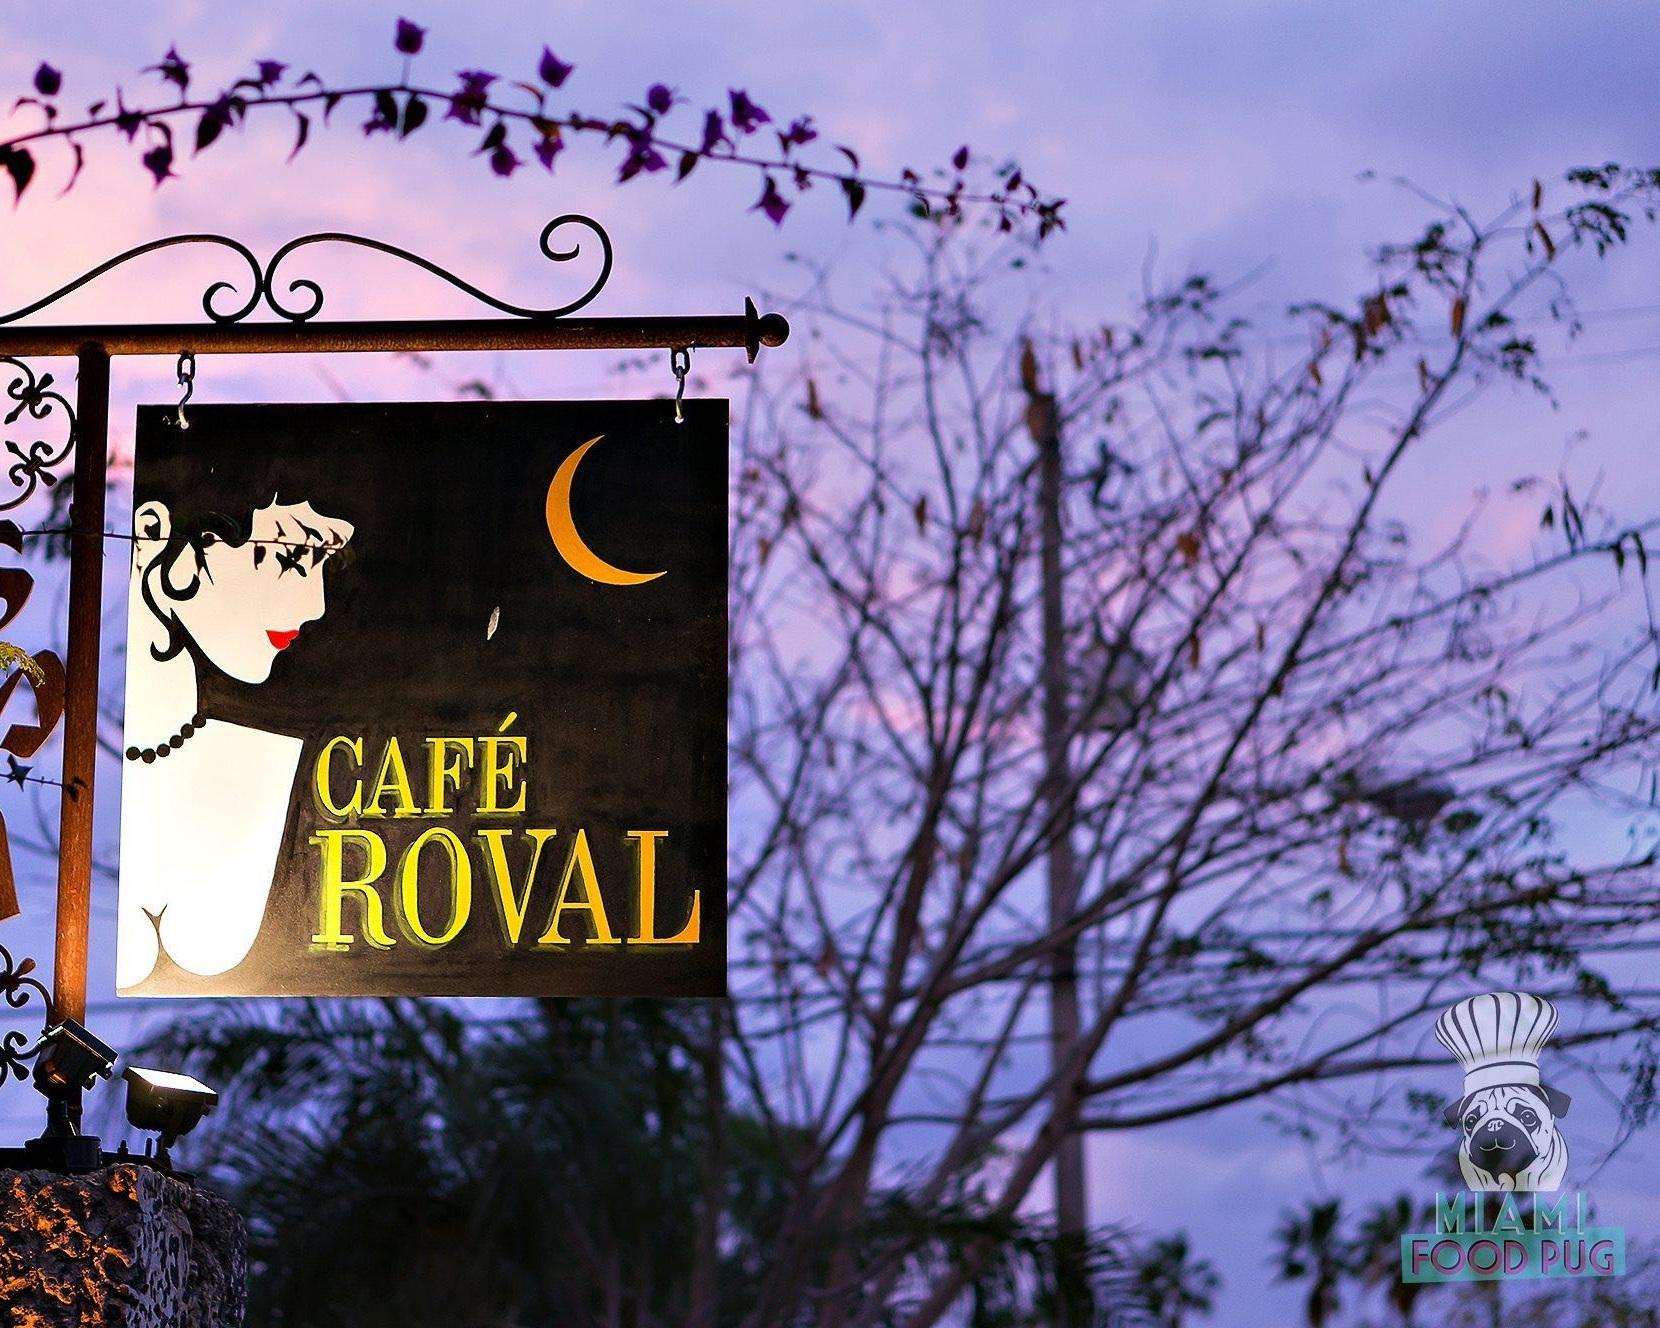 A favorite nighttime spot, Café Roval.